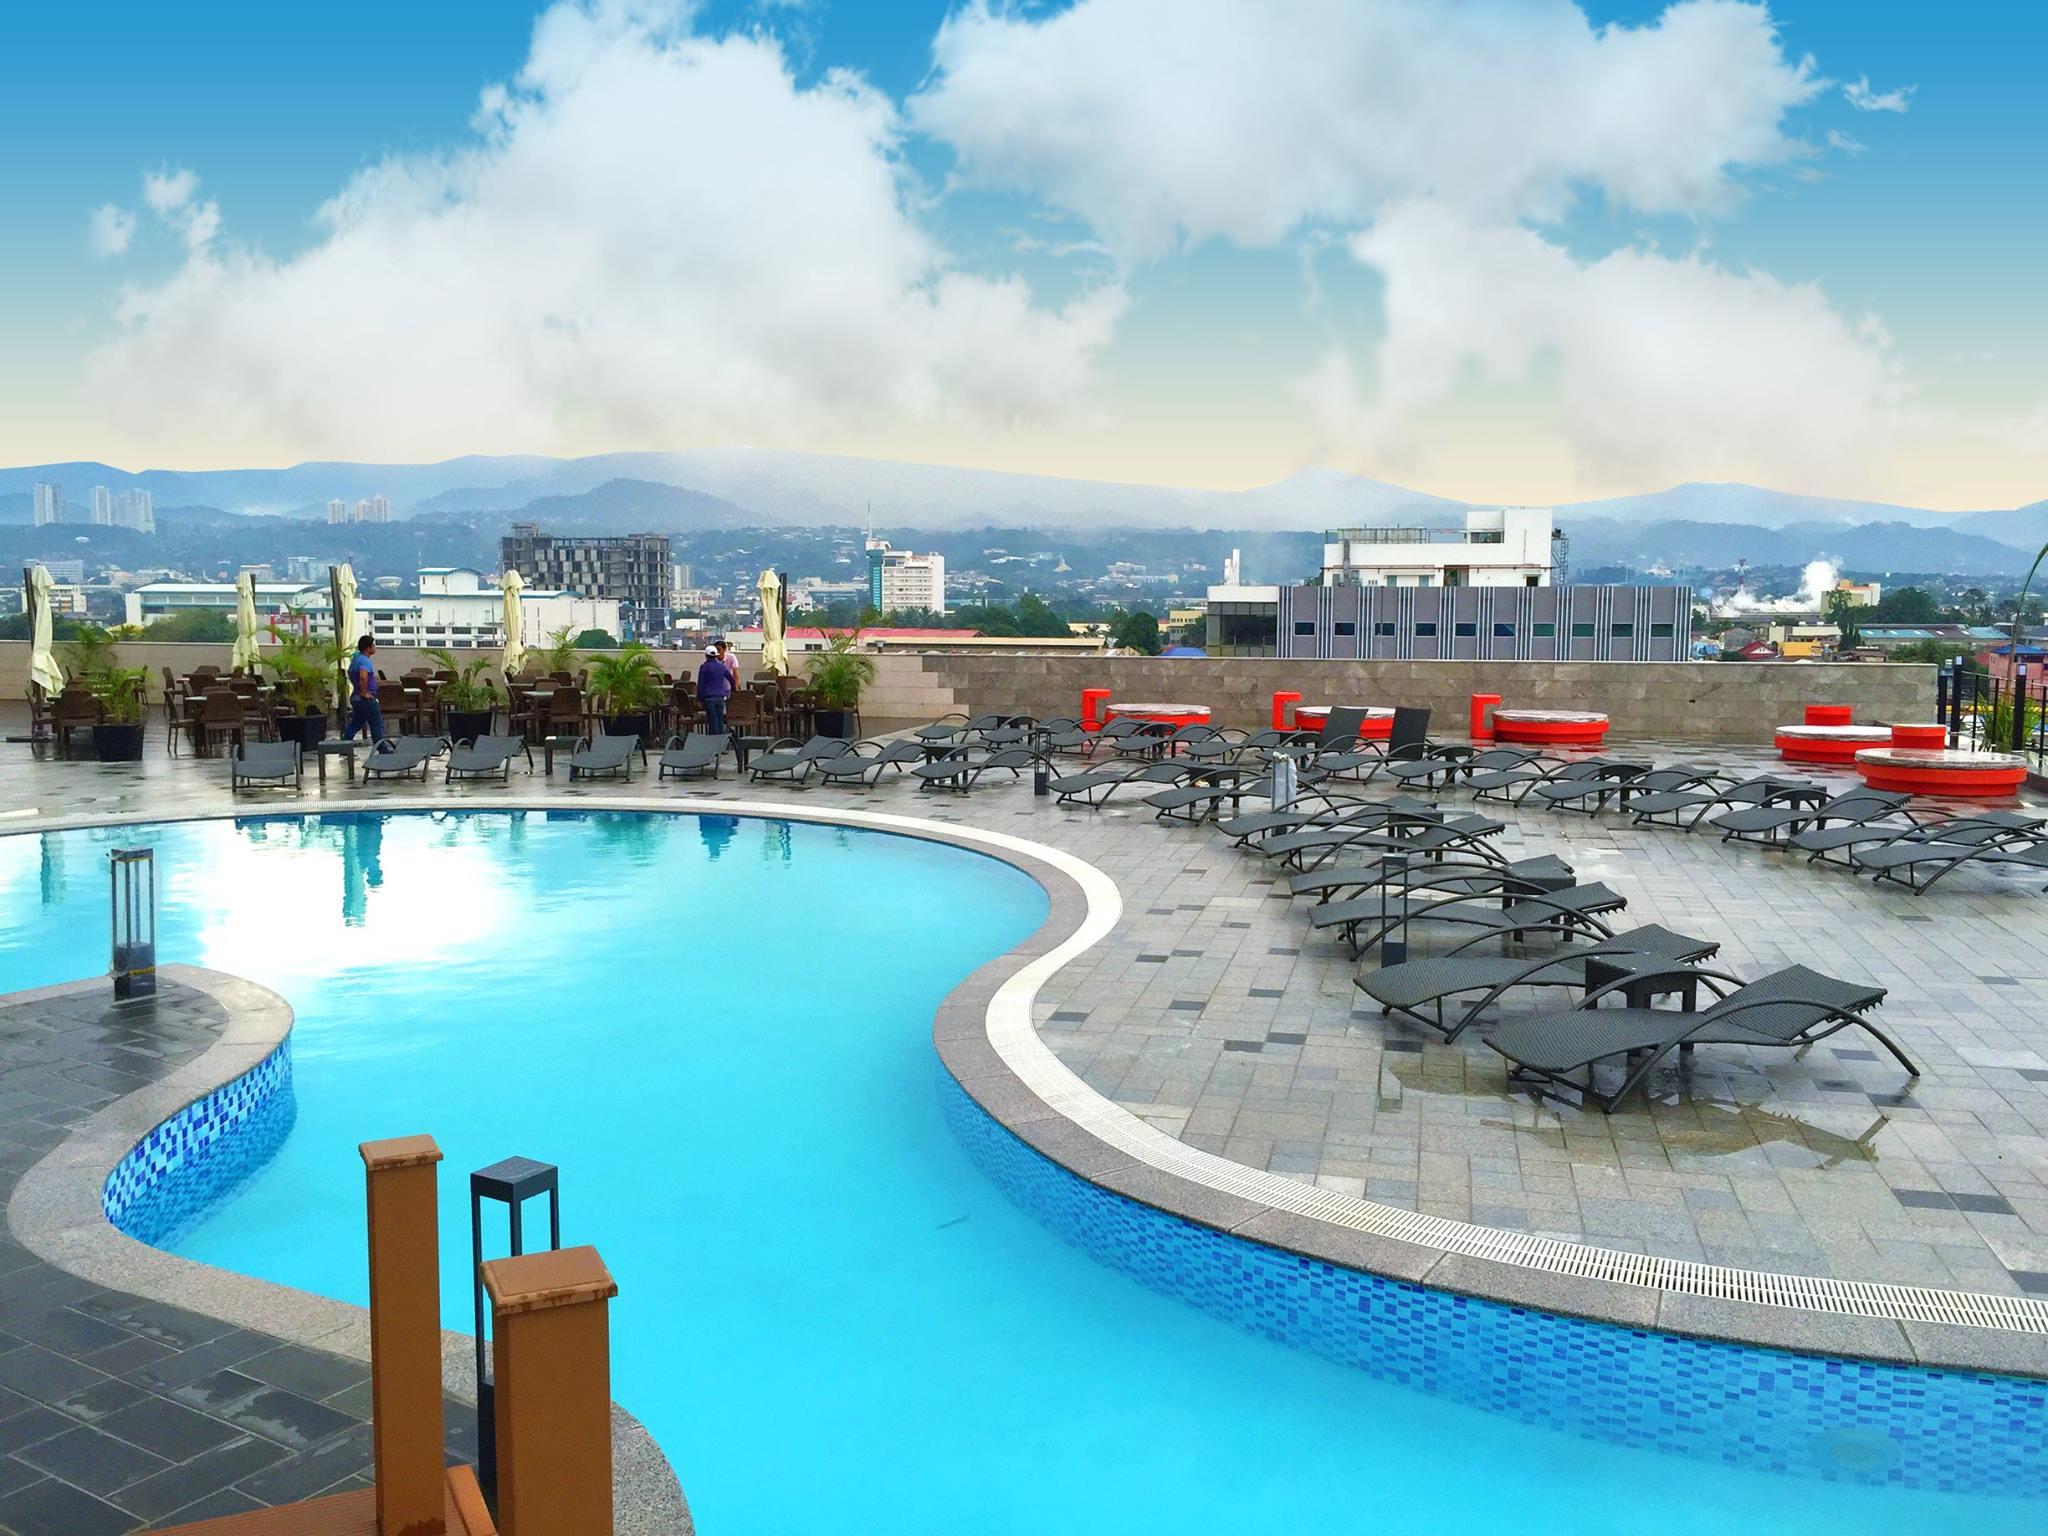 Sky water park(Cebu)